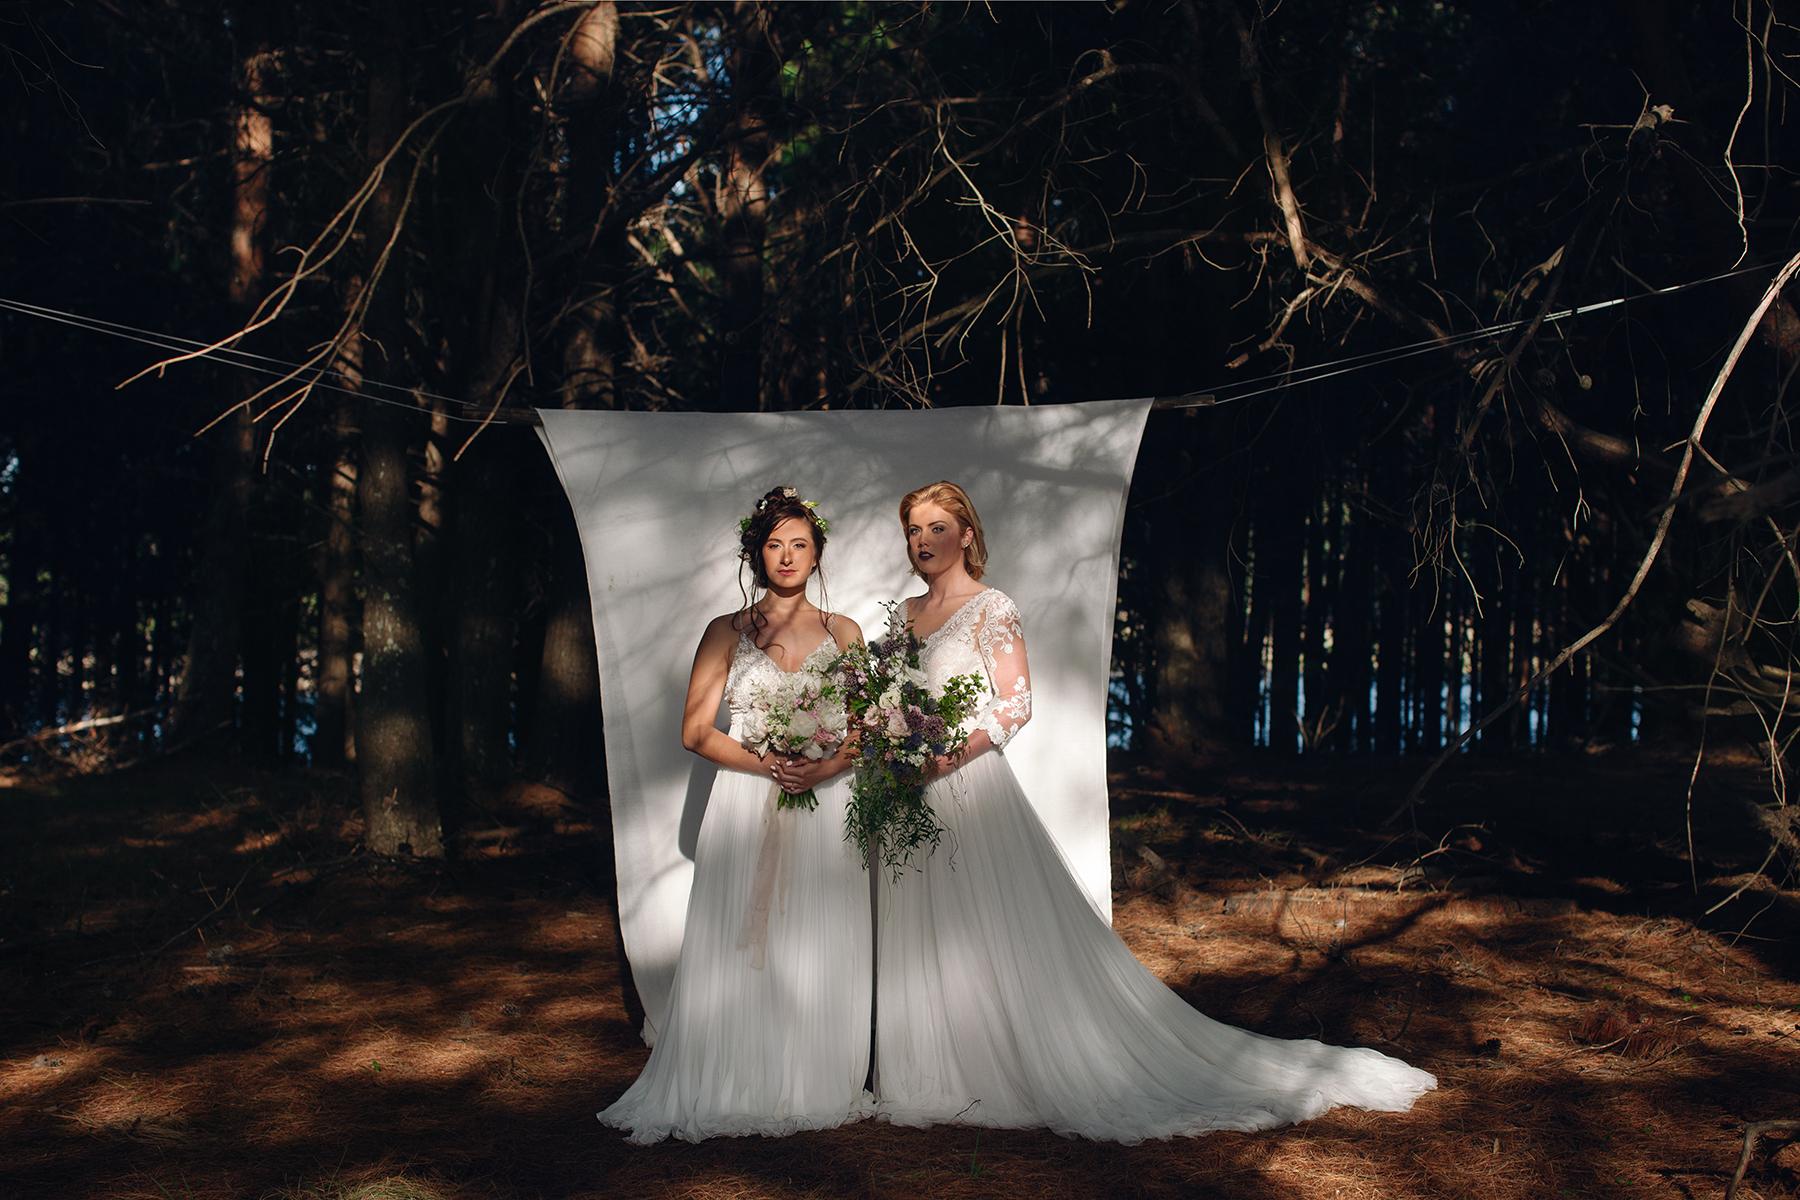 Bridal11Nov2018_HMP_28_Web.jpg